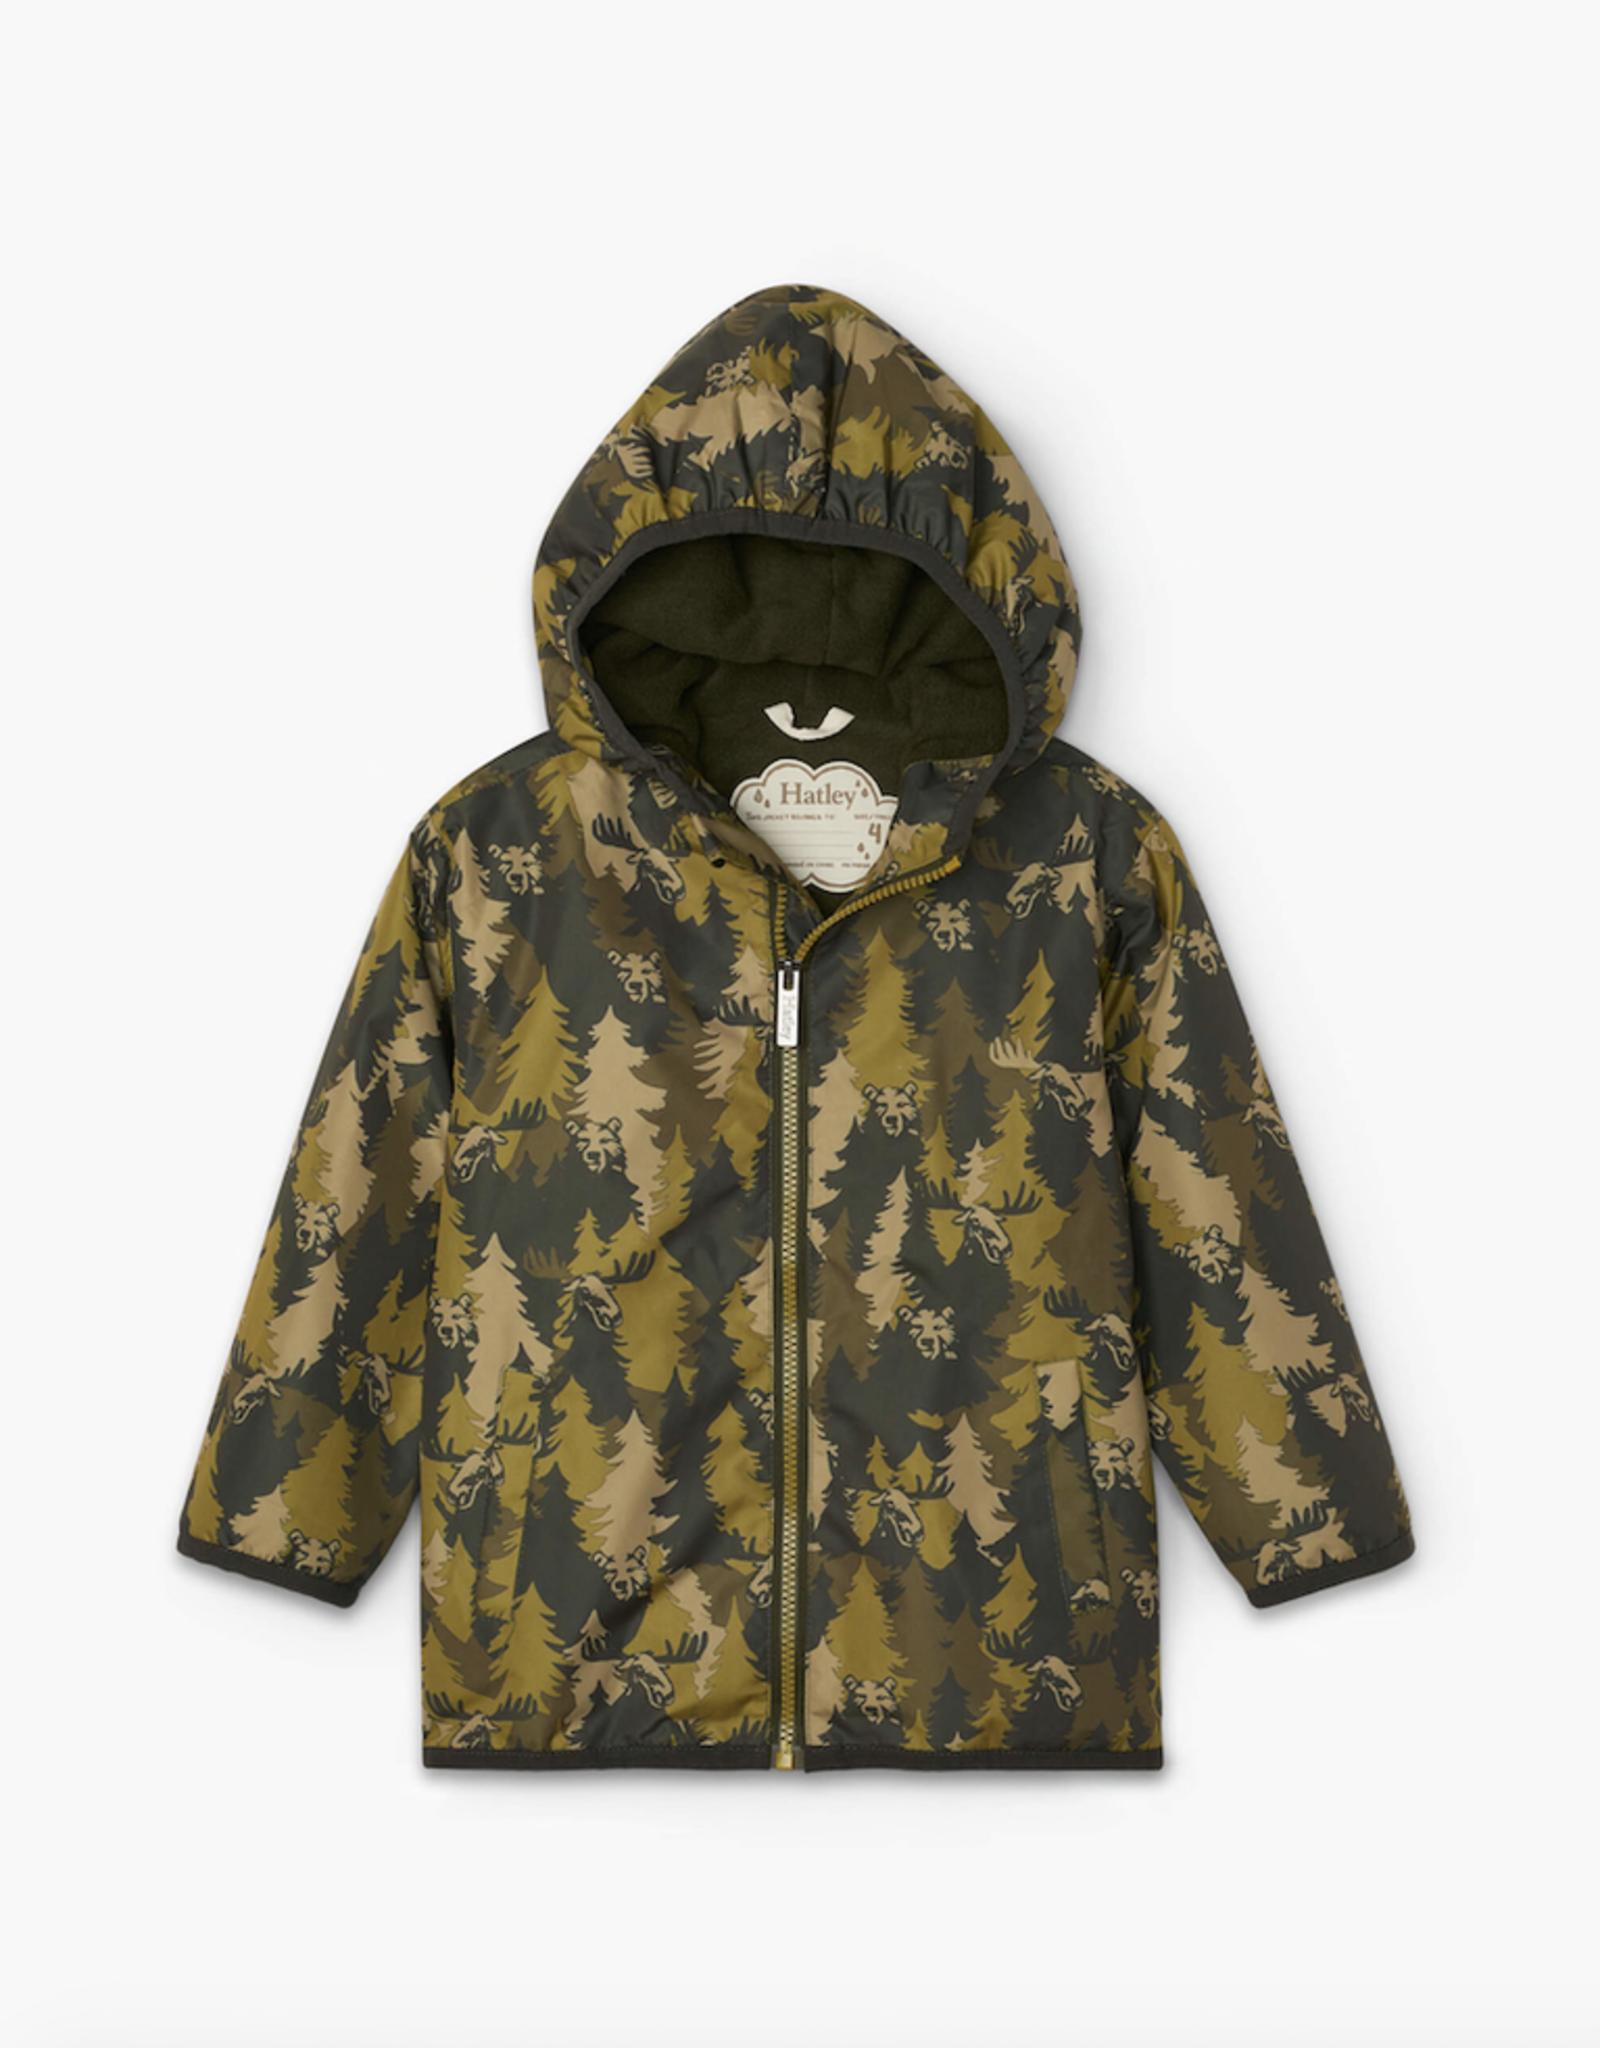 Hatley Forest Camo Microfiber Rain Jacket